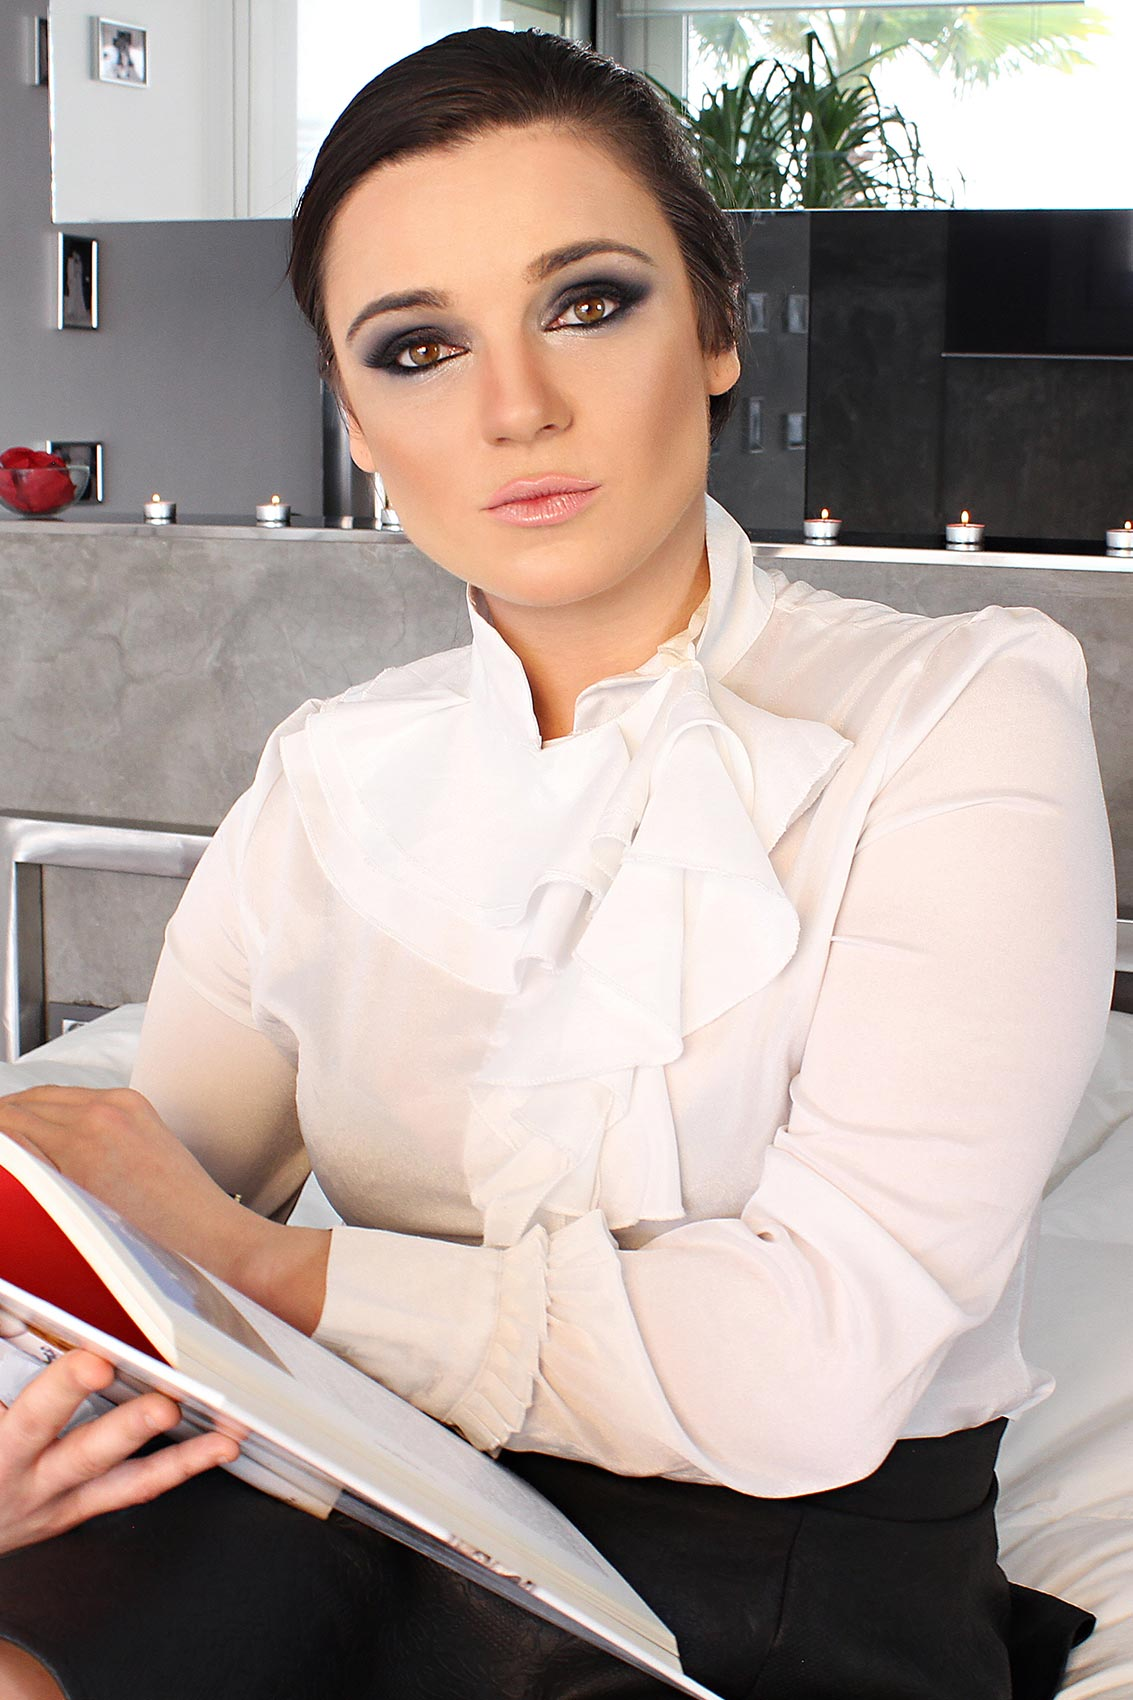 Sienna Knight image